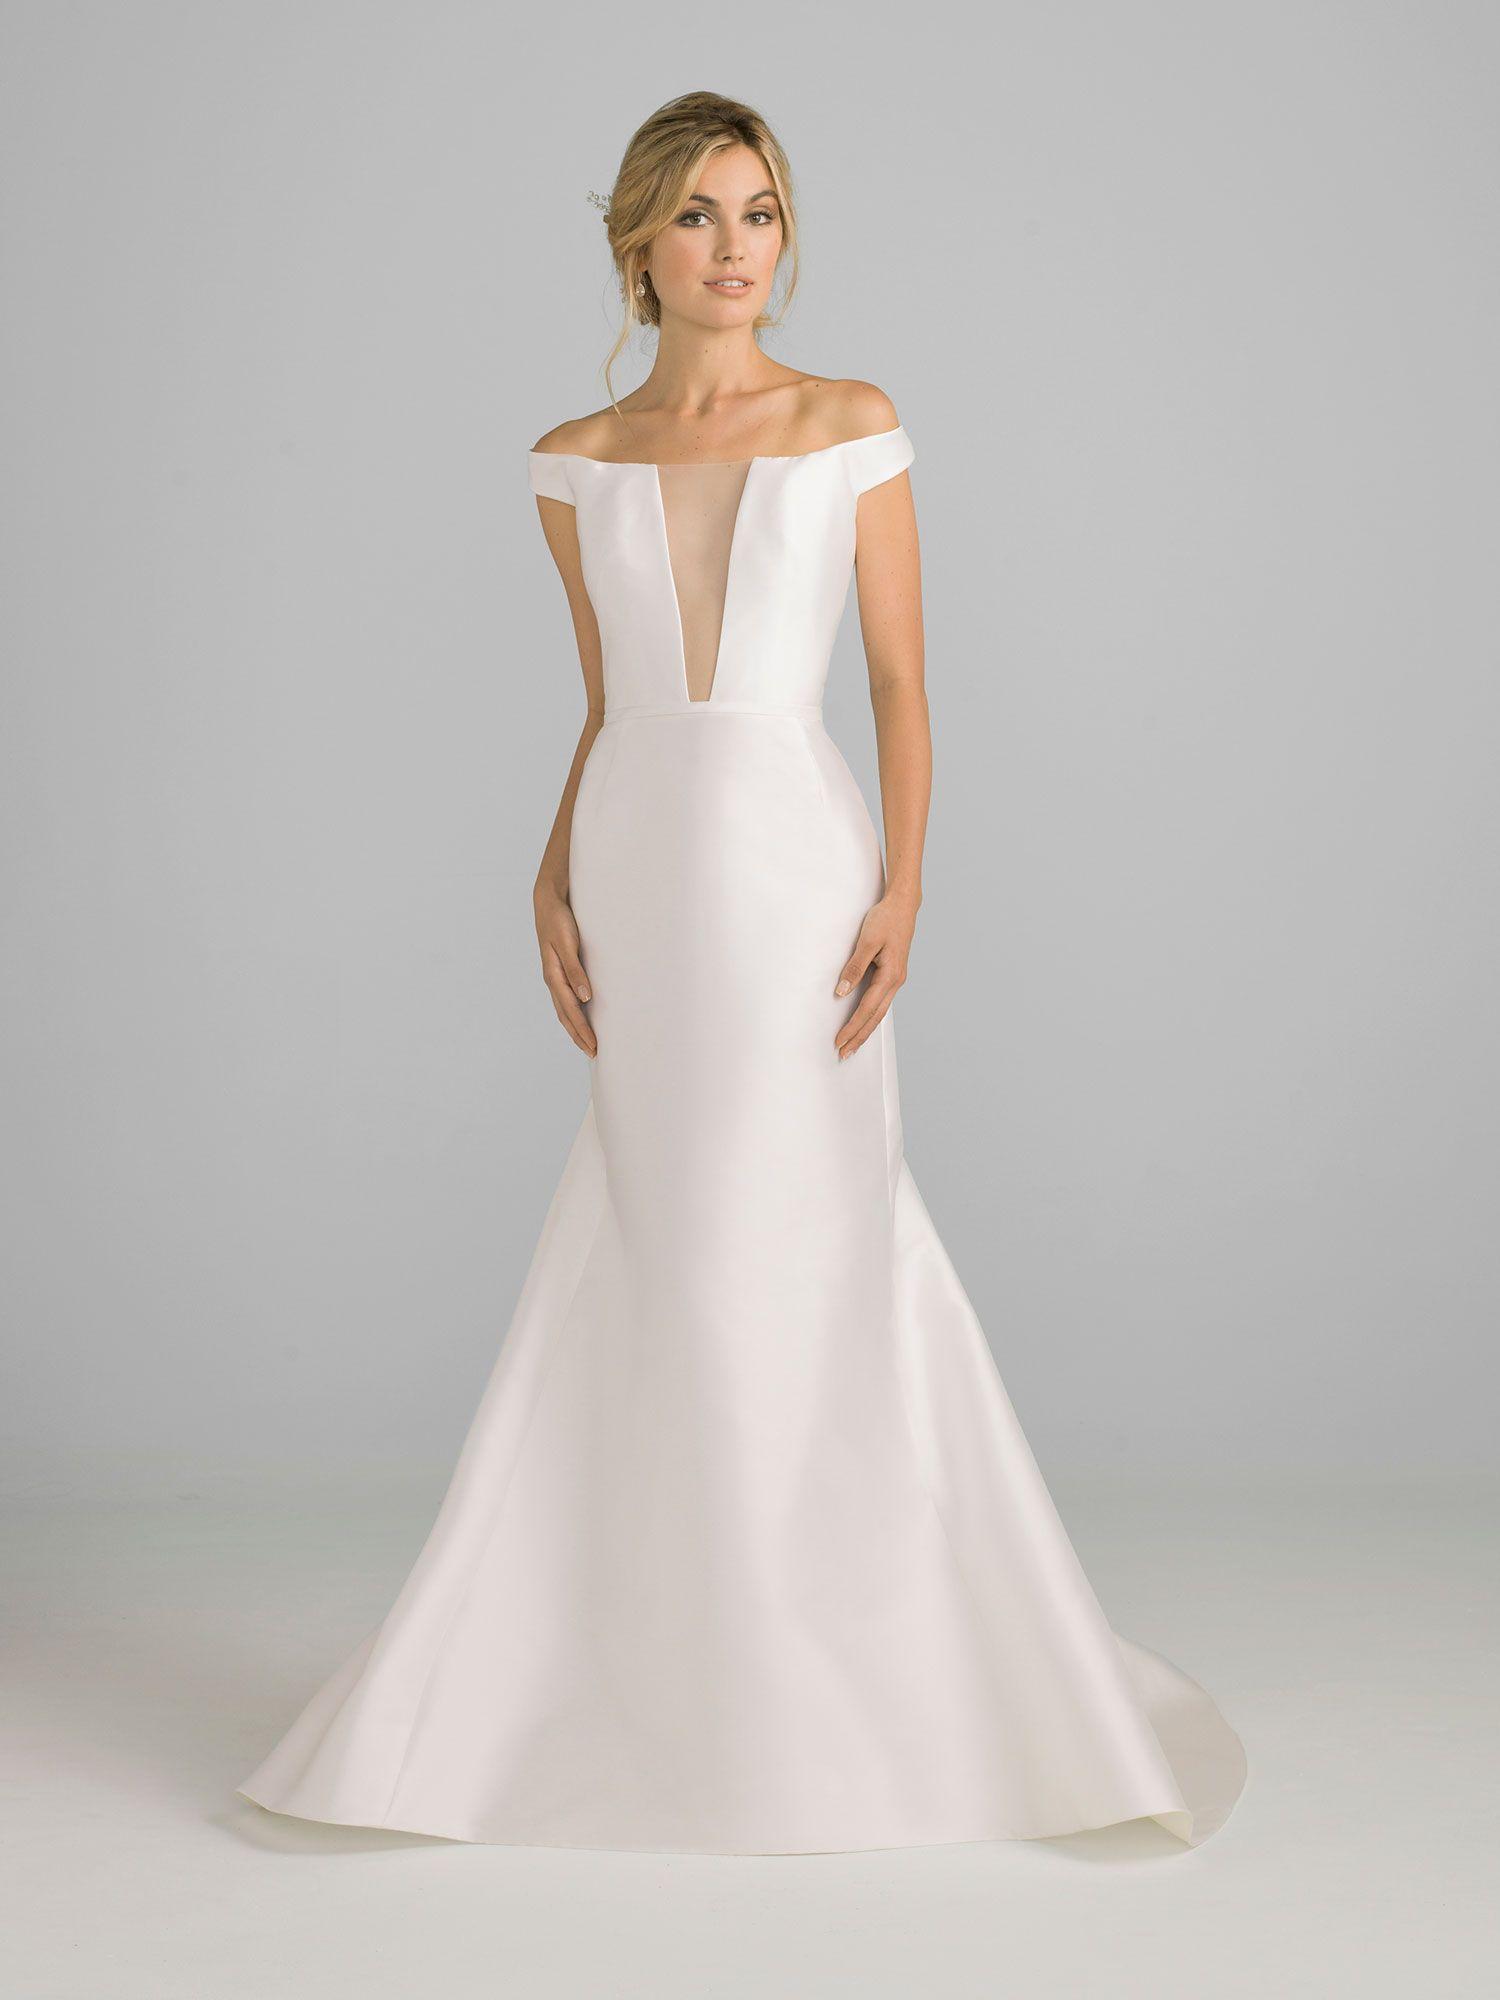 Azul By Liancarlo 18111 Wedding Dresses Wedding Gown Inspiration Wedding Dresses Photos